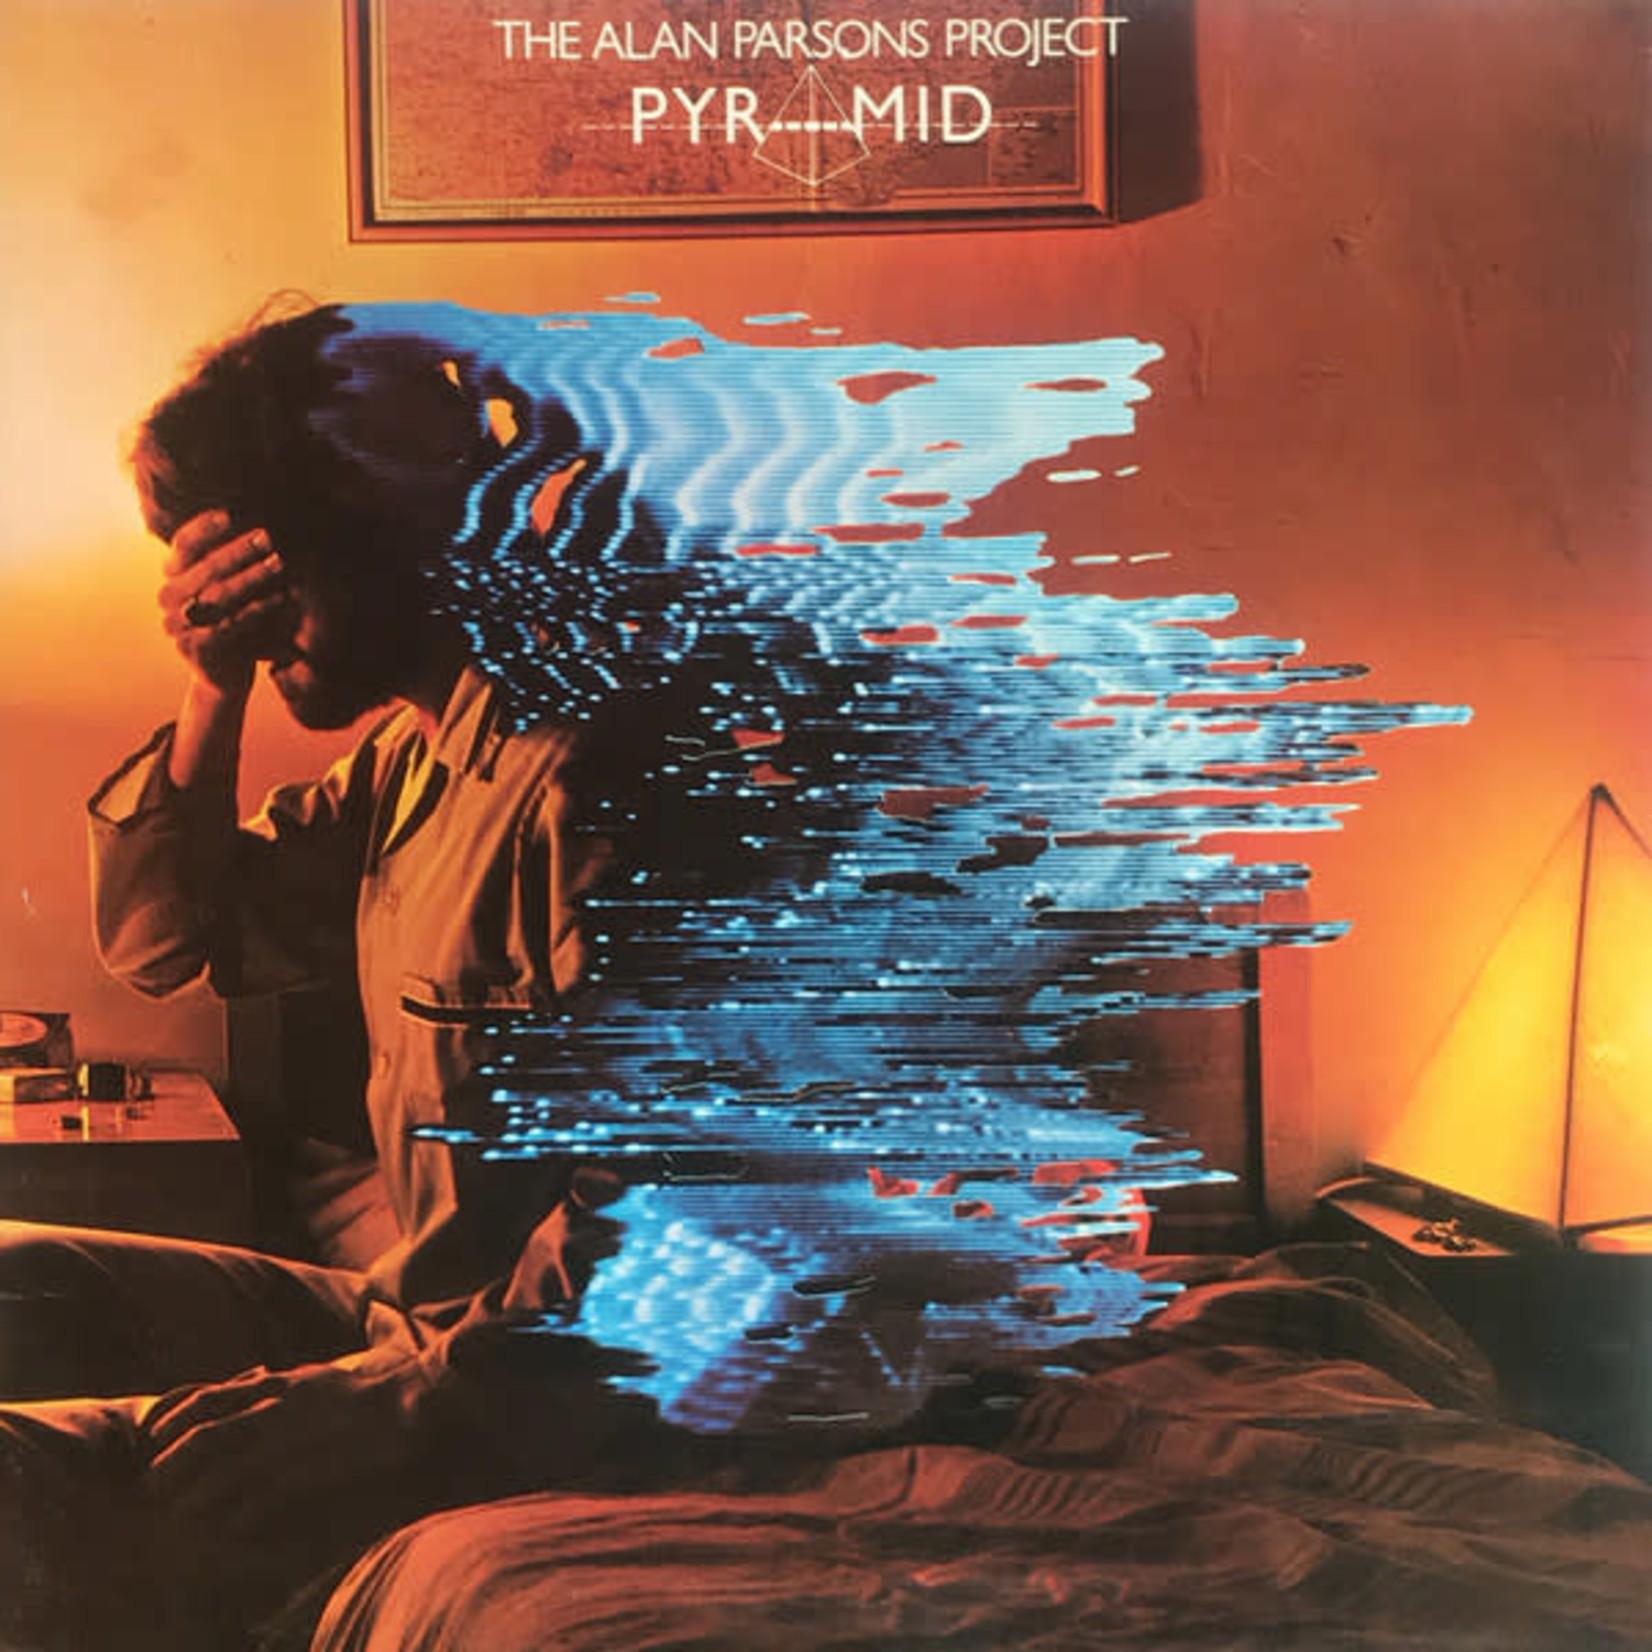 [Vintage] Parsons, Alan: Pyramid